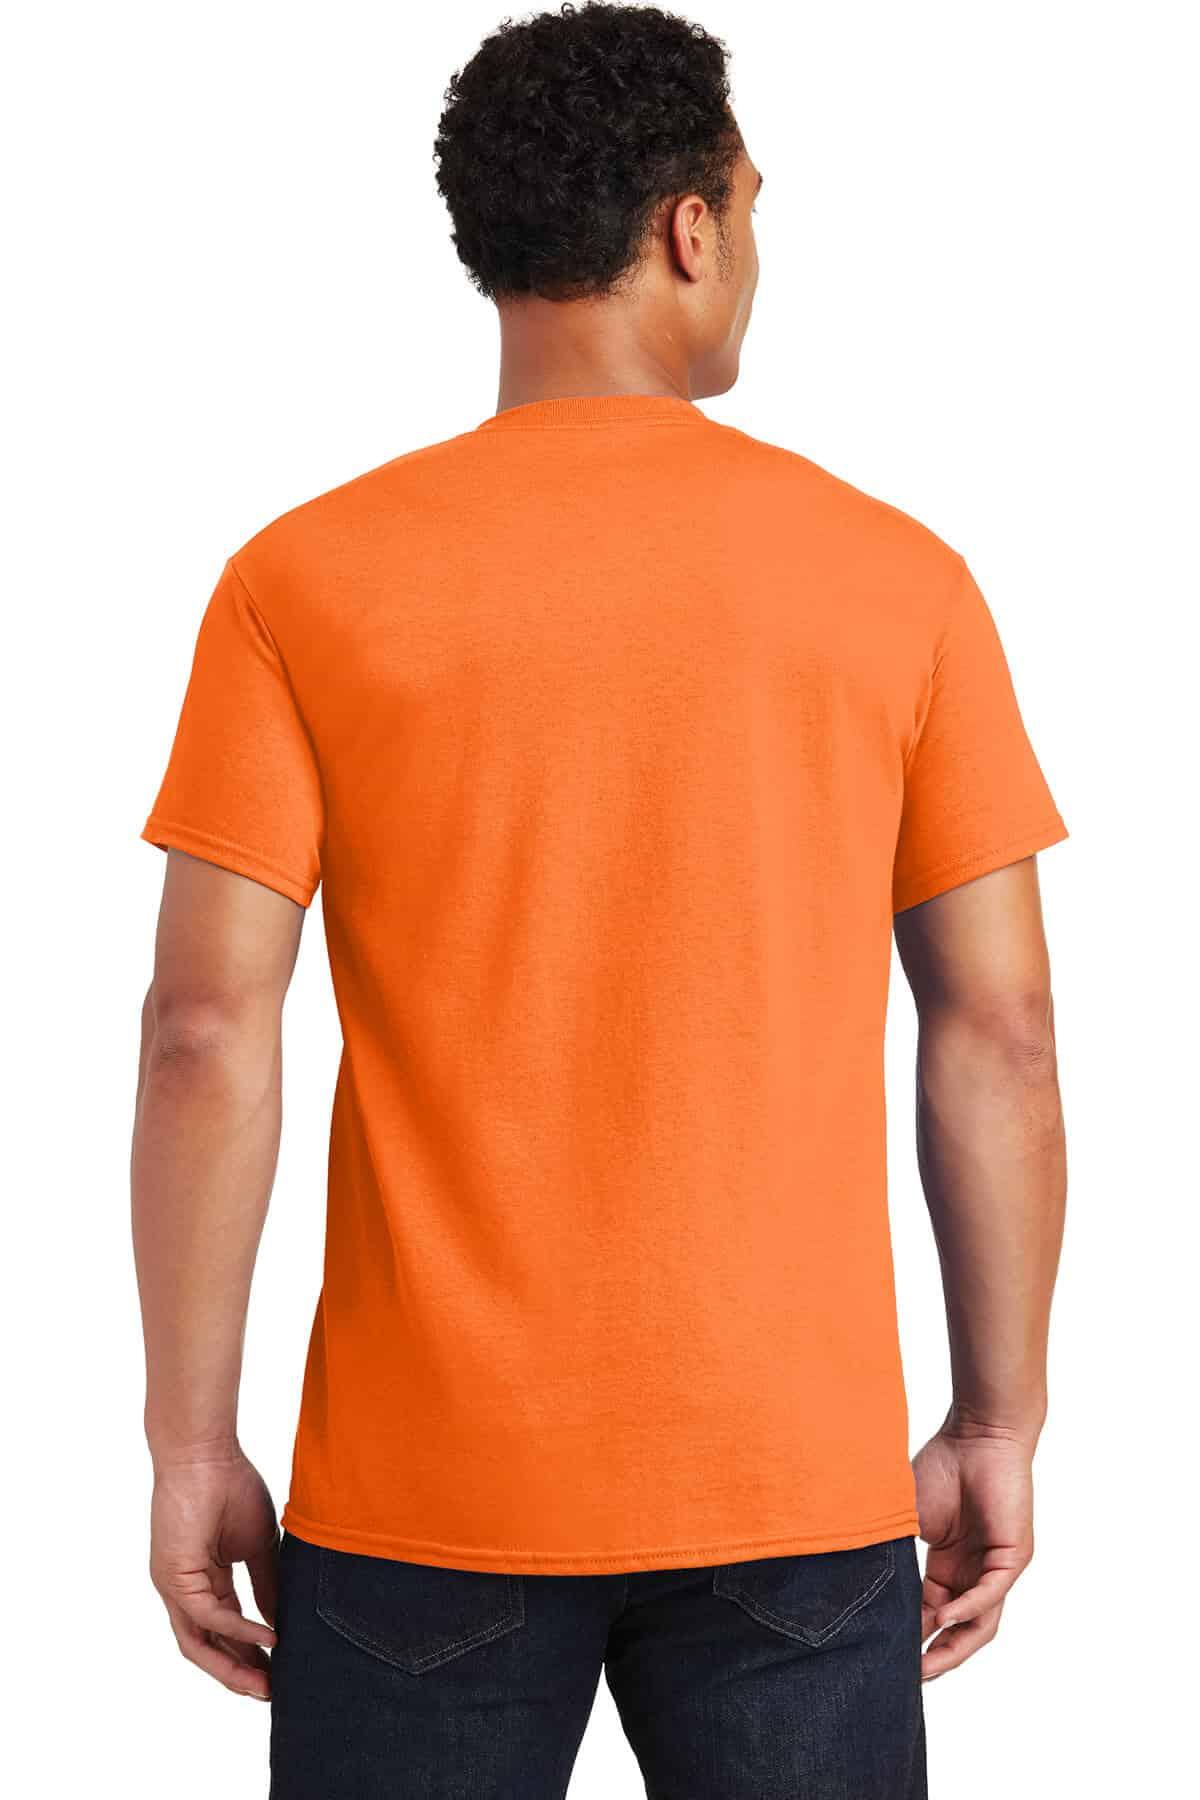 Southern Orange T-Back